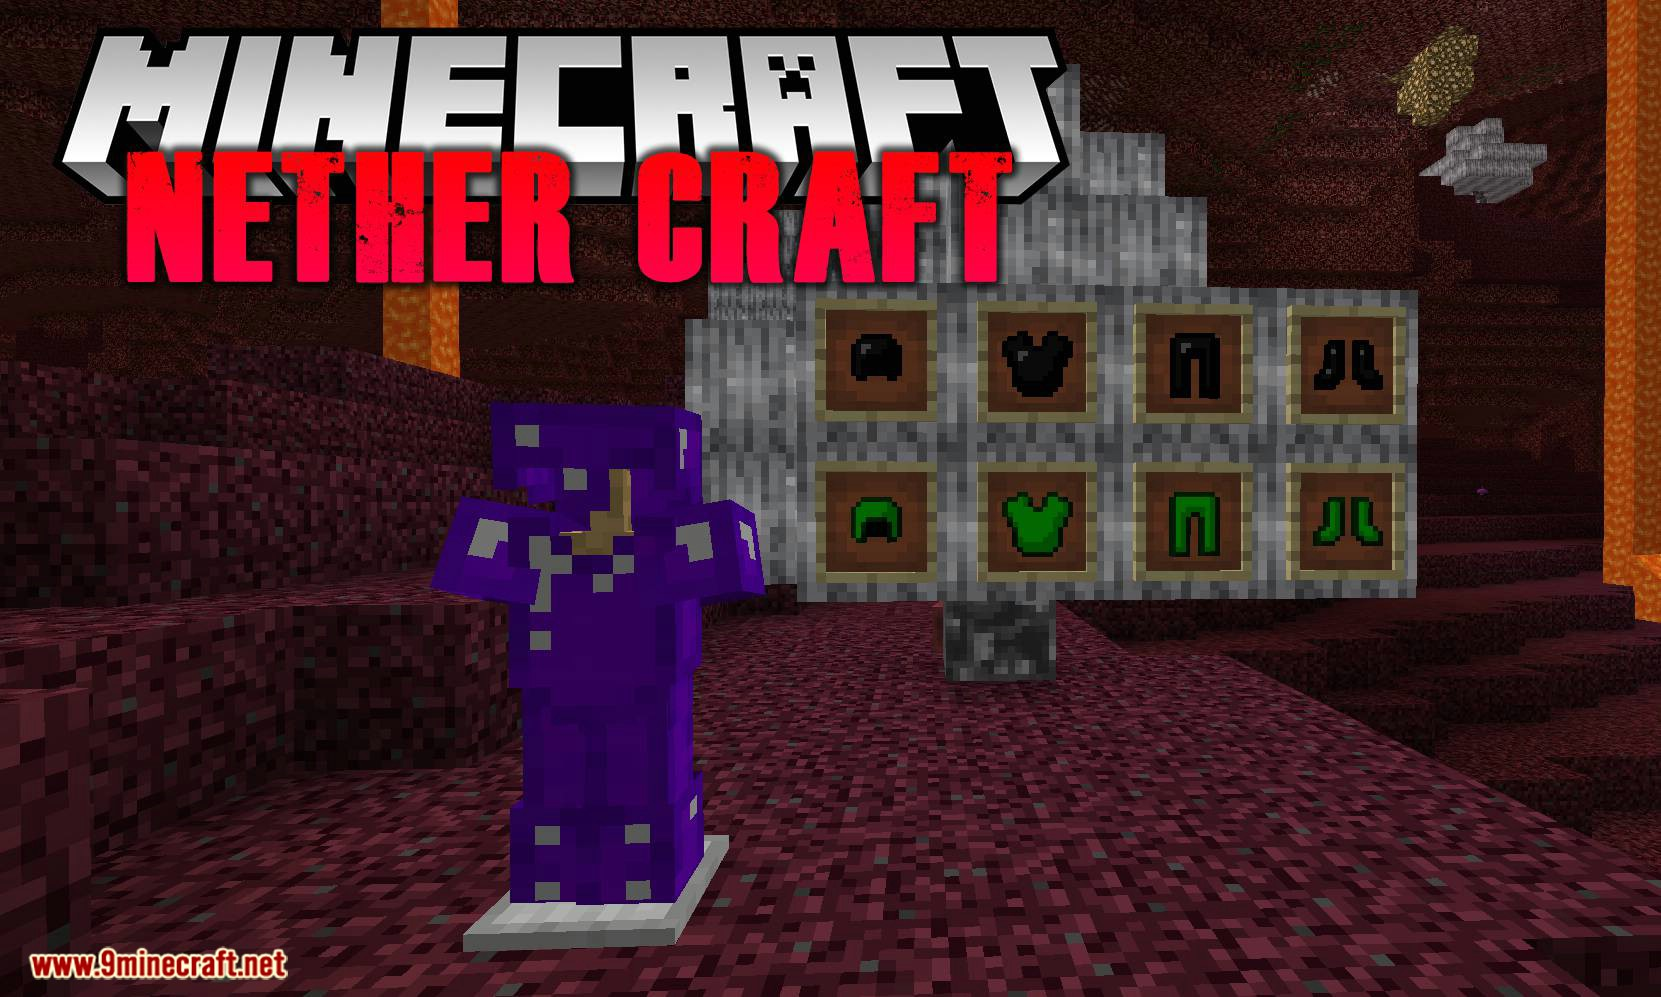 Nether Craft mod for minecraft logo